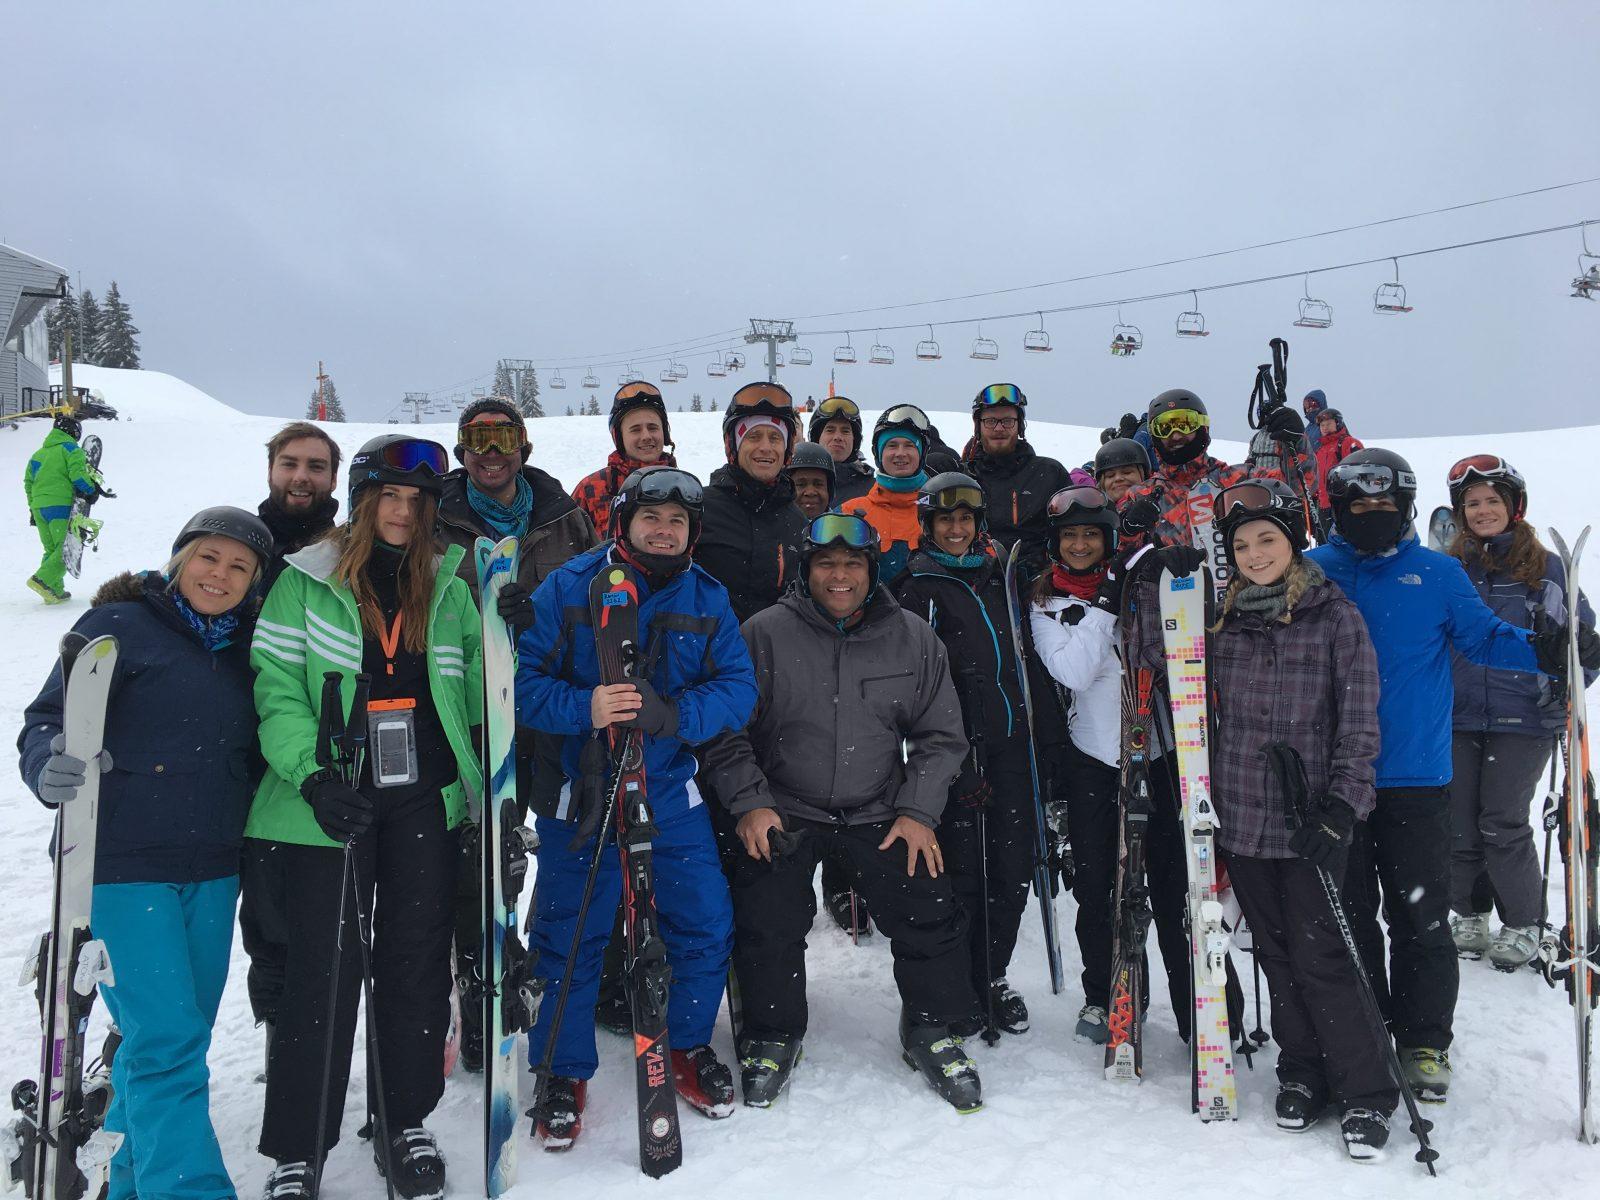 Corporate peaks group on a ski mountain